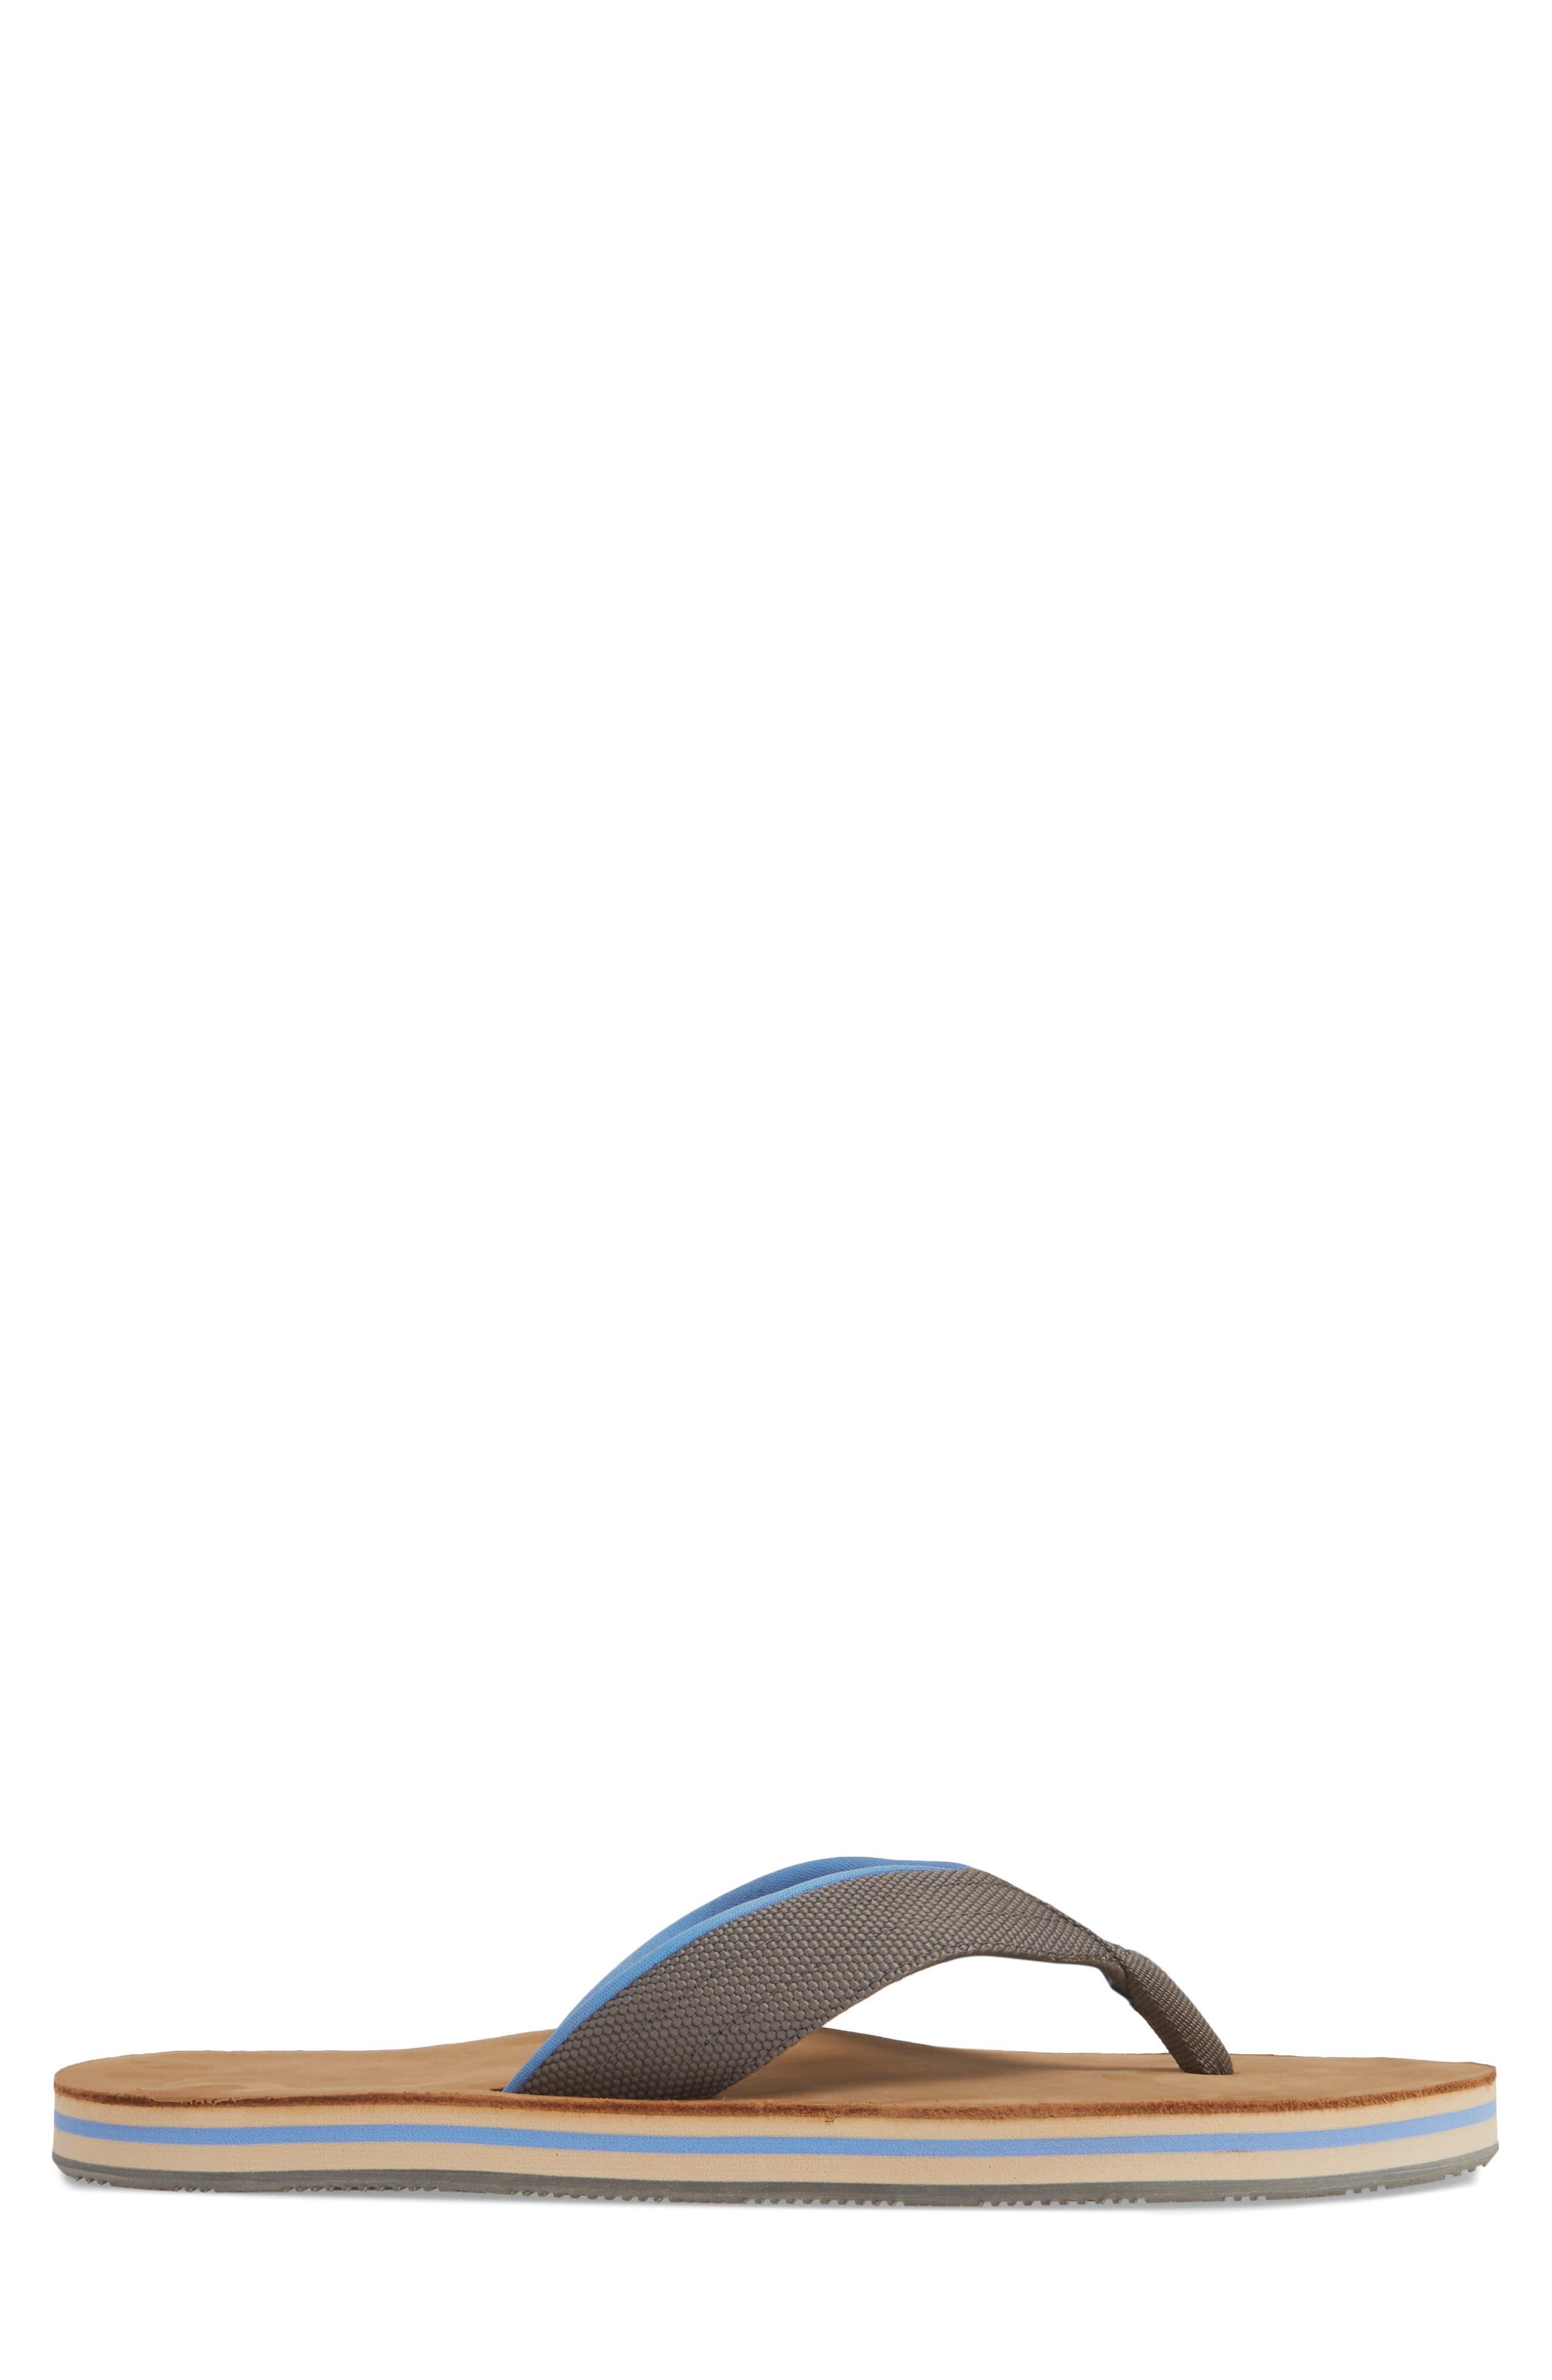 HARI MARI, 'Scouts' Flip Flop, Alternate thumbnail 3, color, GRAY/ BLUE